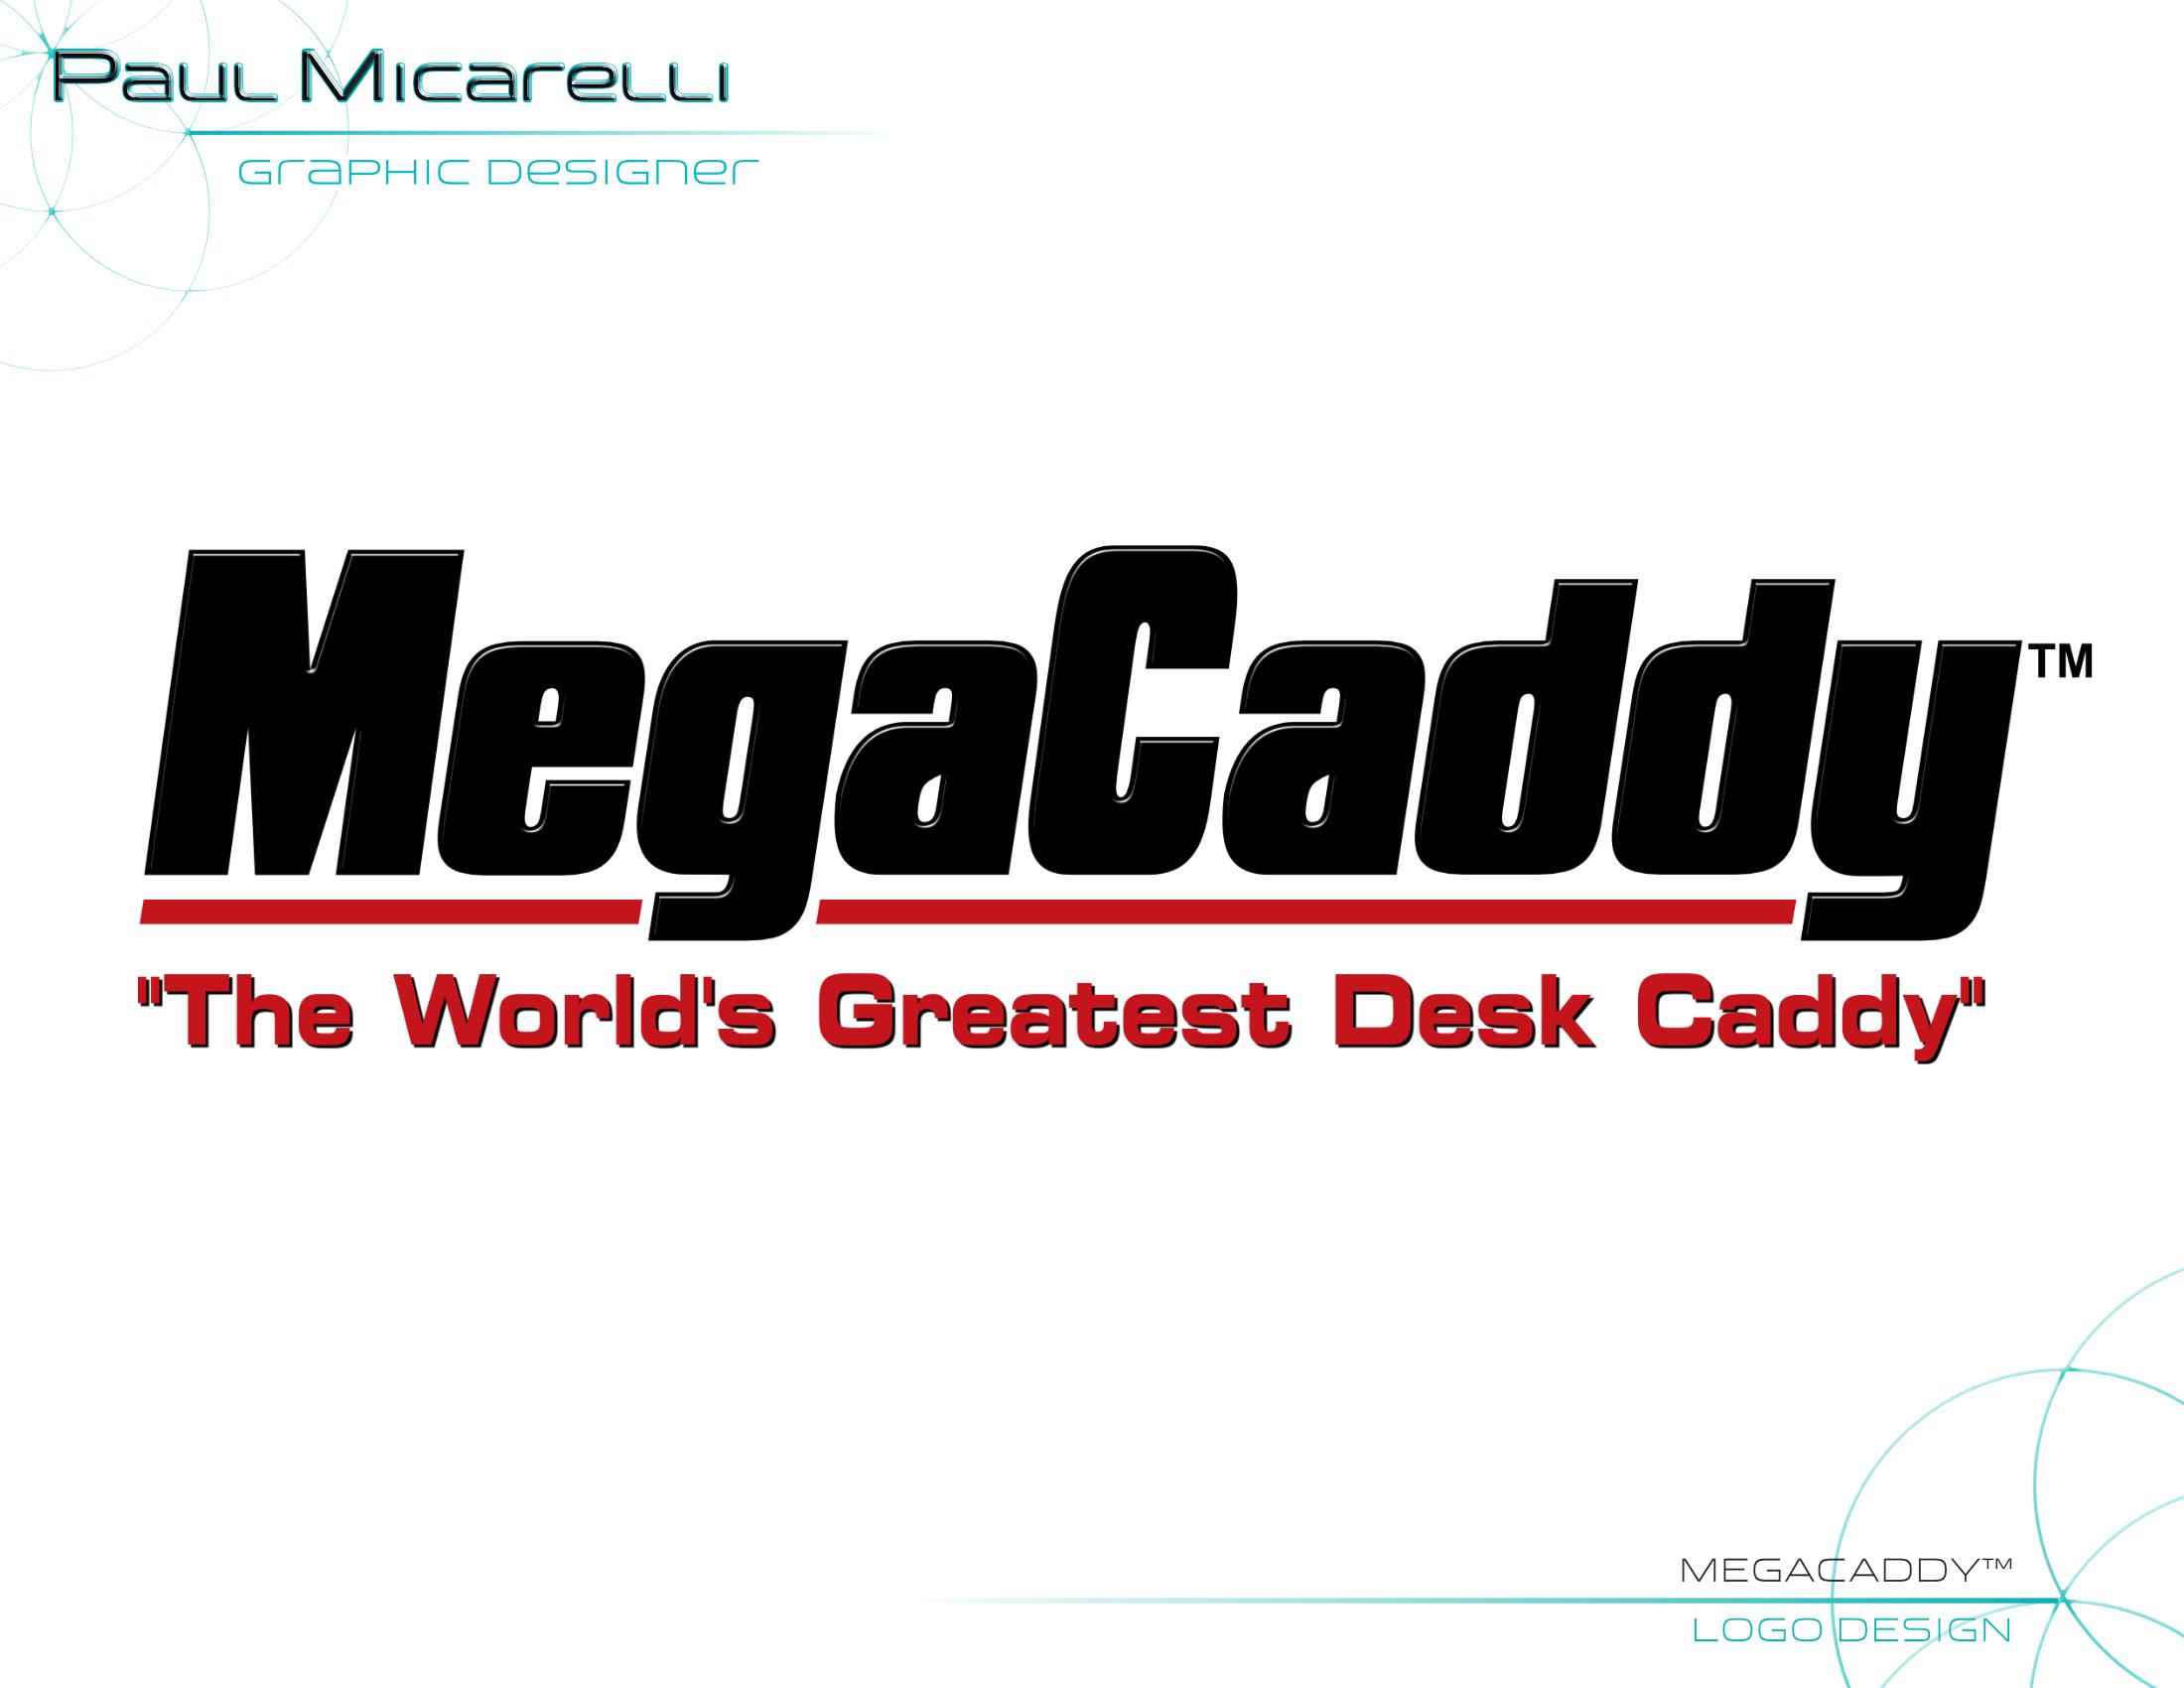 Paul-Micarelli-MegaCaddy Logo